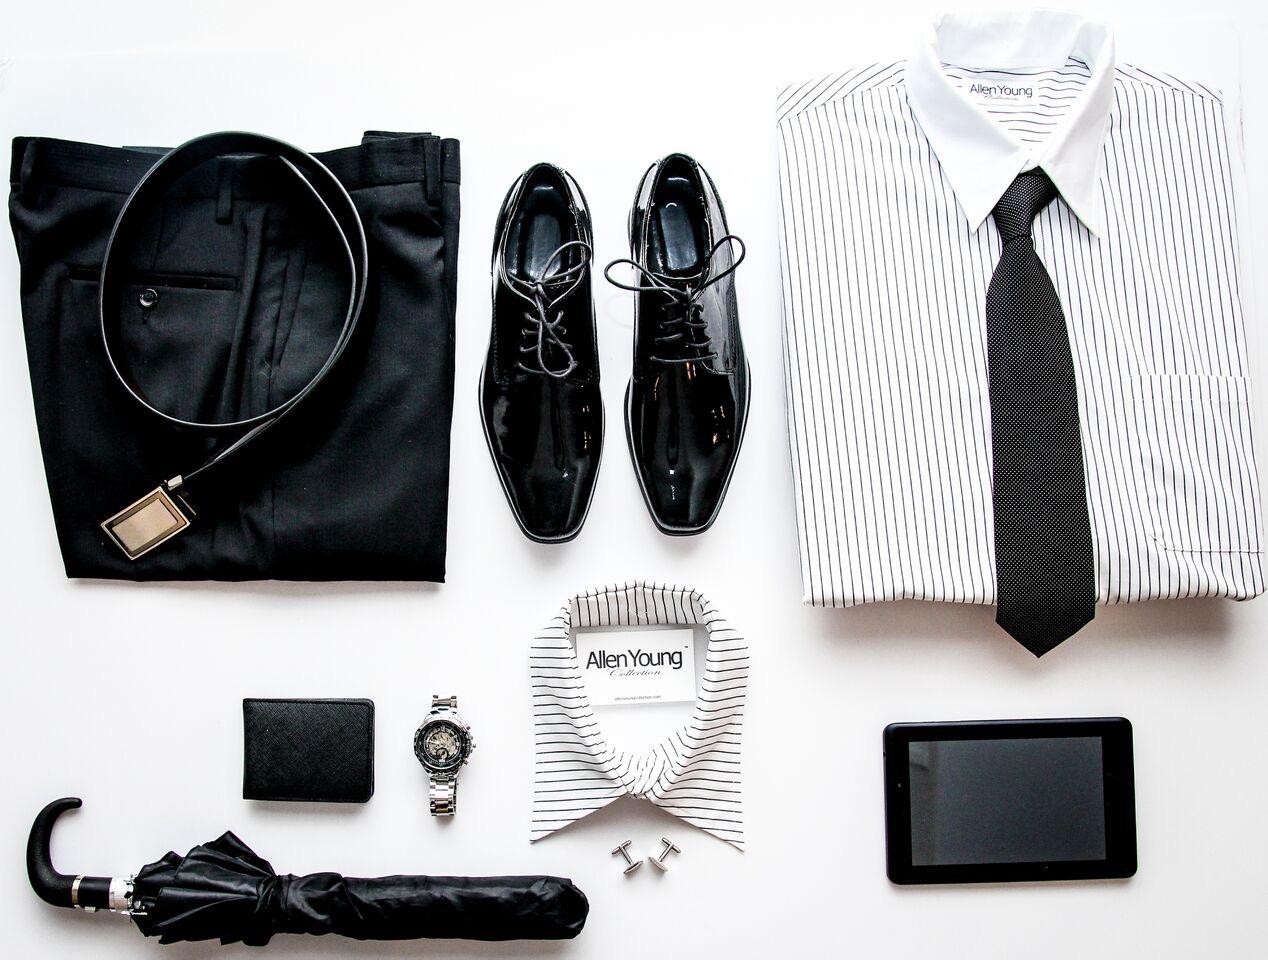 Allen Young Collection – Advanced Men's Dress Shirts